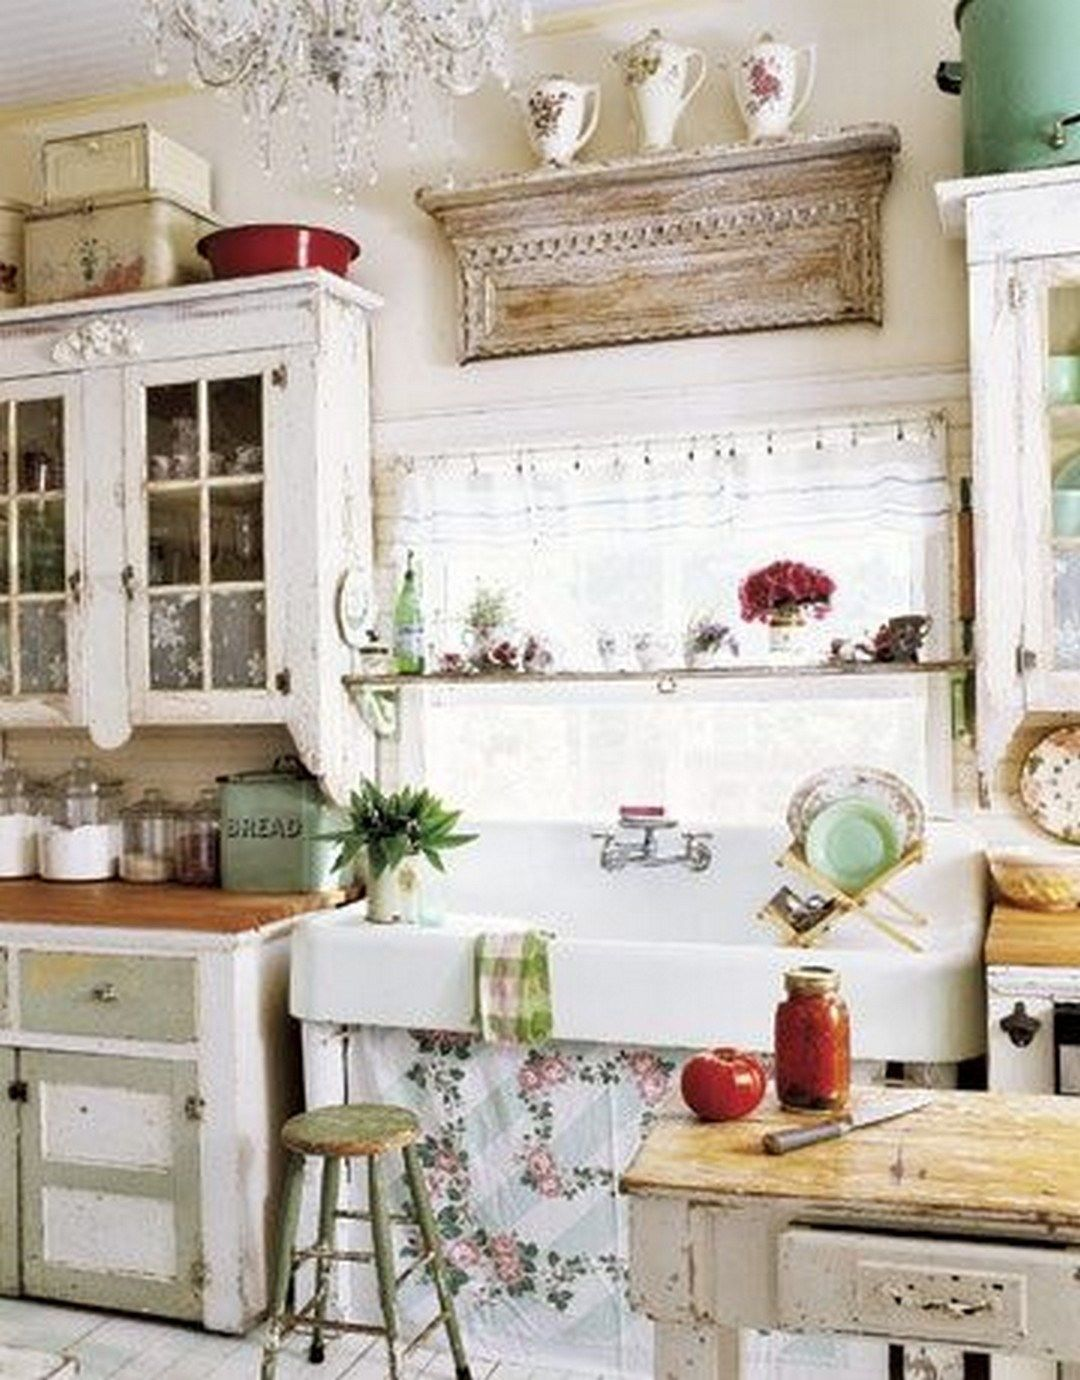 33 Charming French Kitchen Decor Inspirational Ideas (29 ...